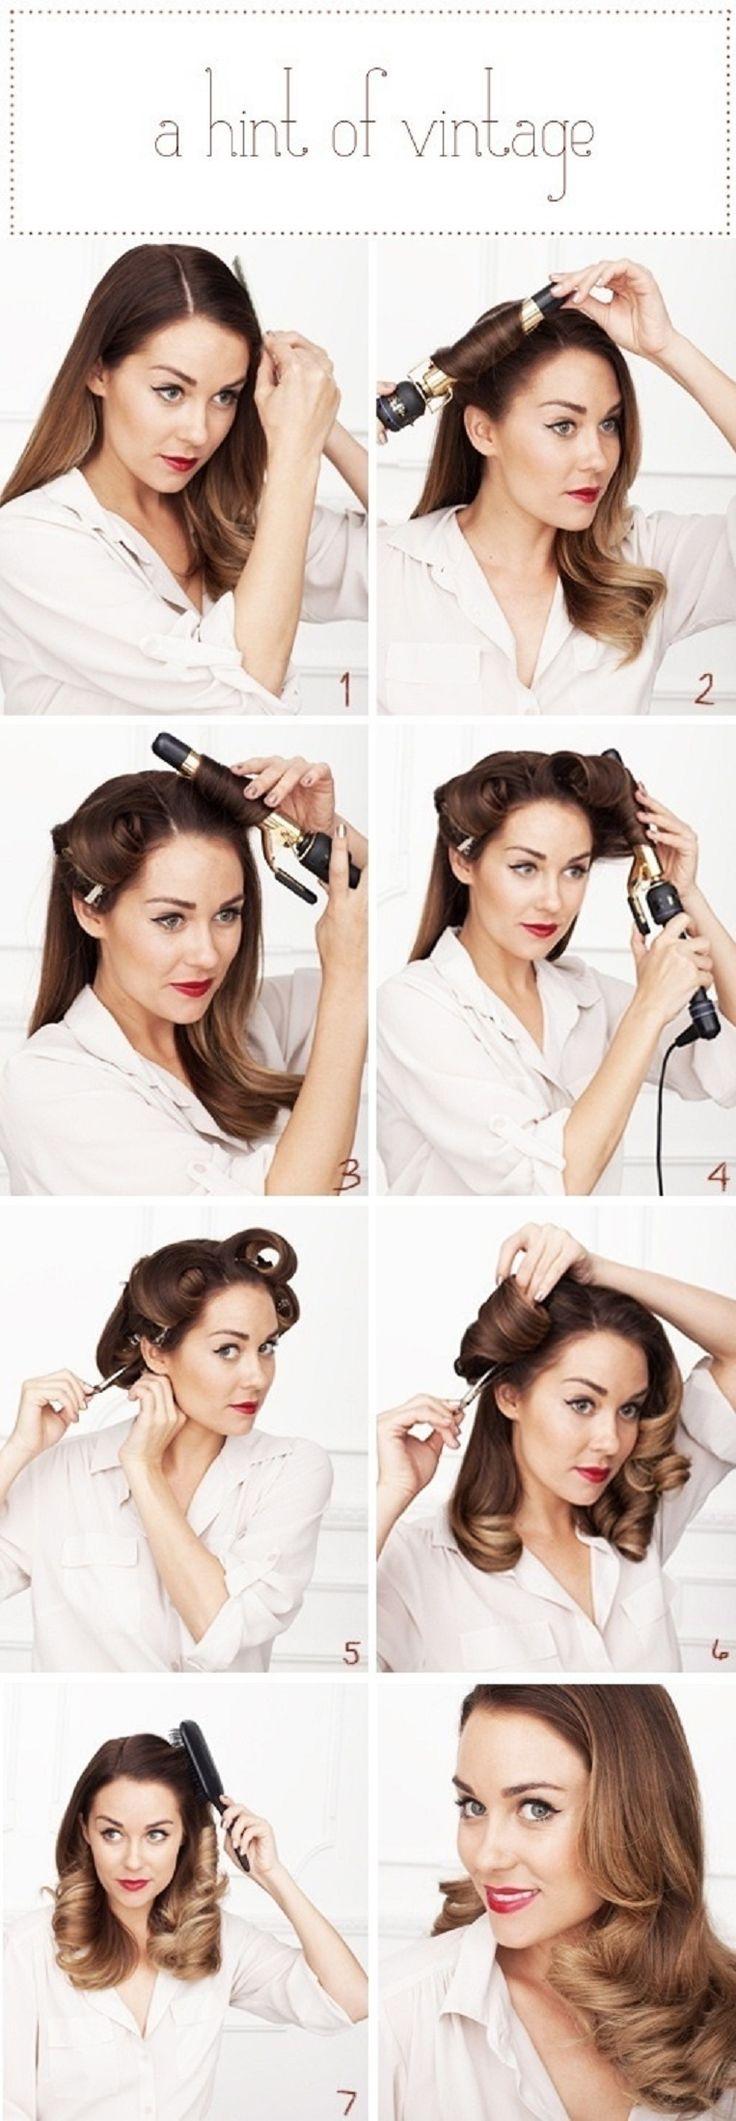 12 Vintage-Inspired DIY Hairstyle Tutorials | GleamItUp